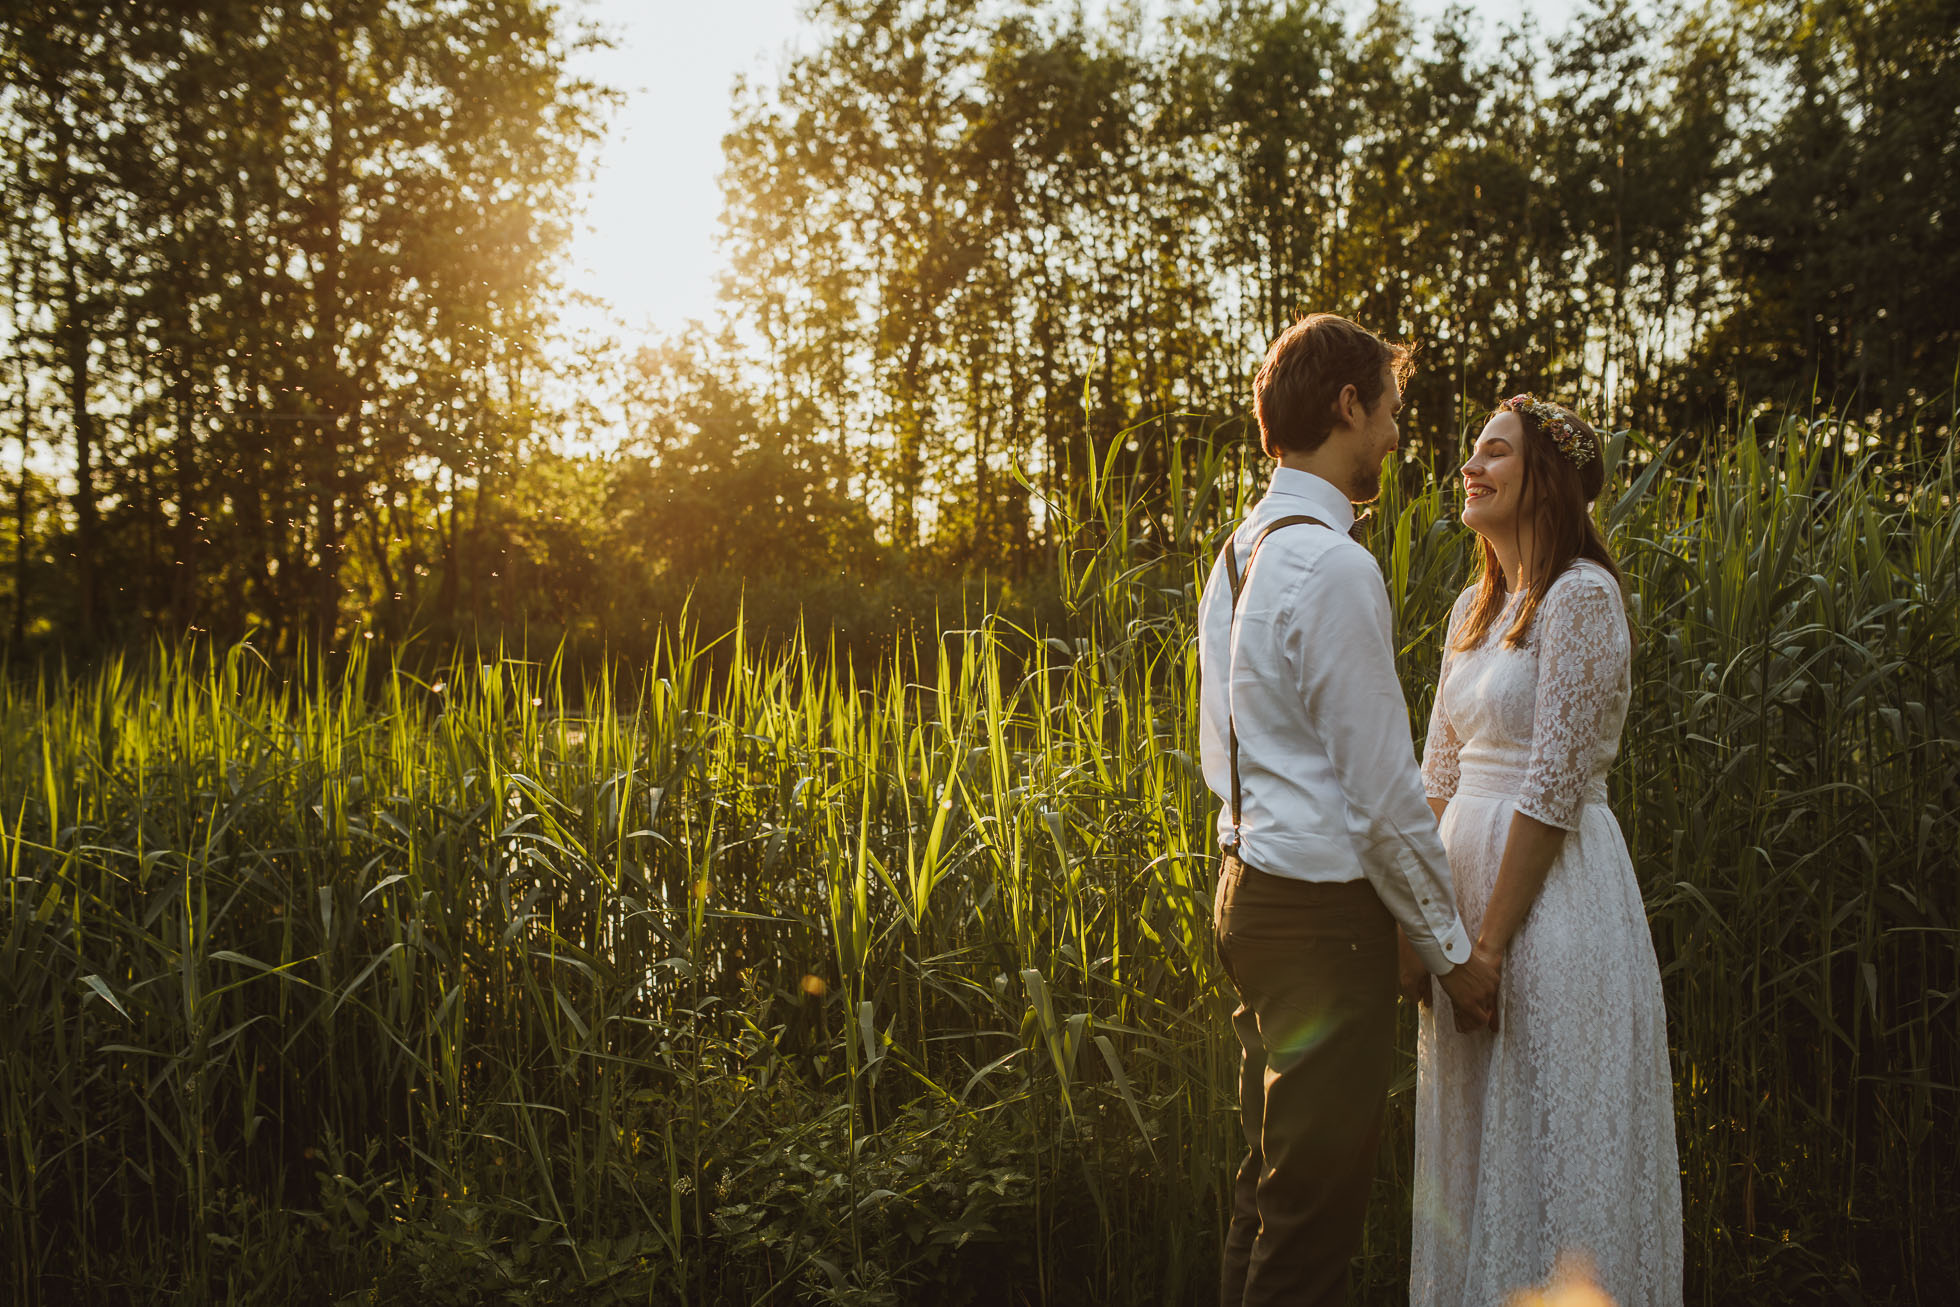 utrecht-wedding-photographer-129.jpg